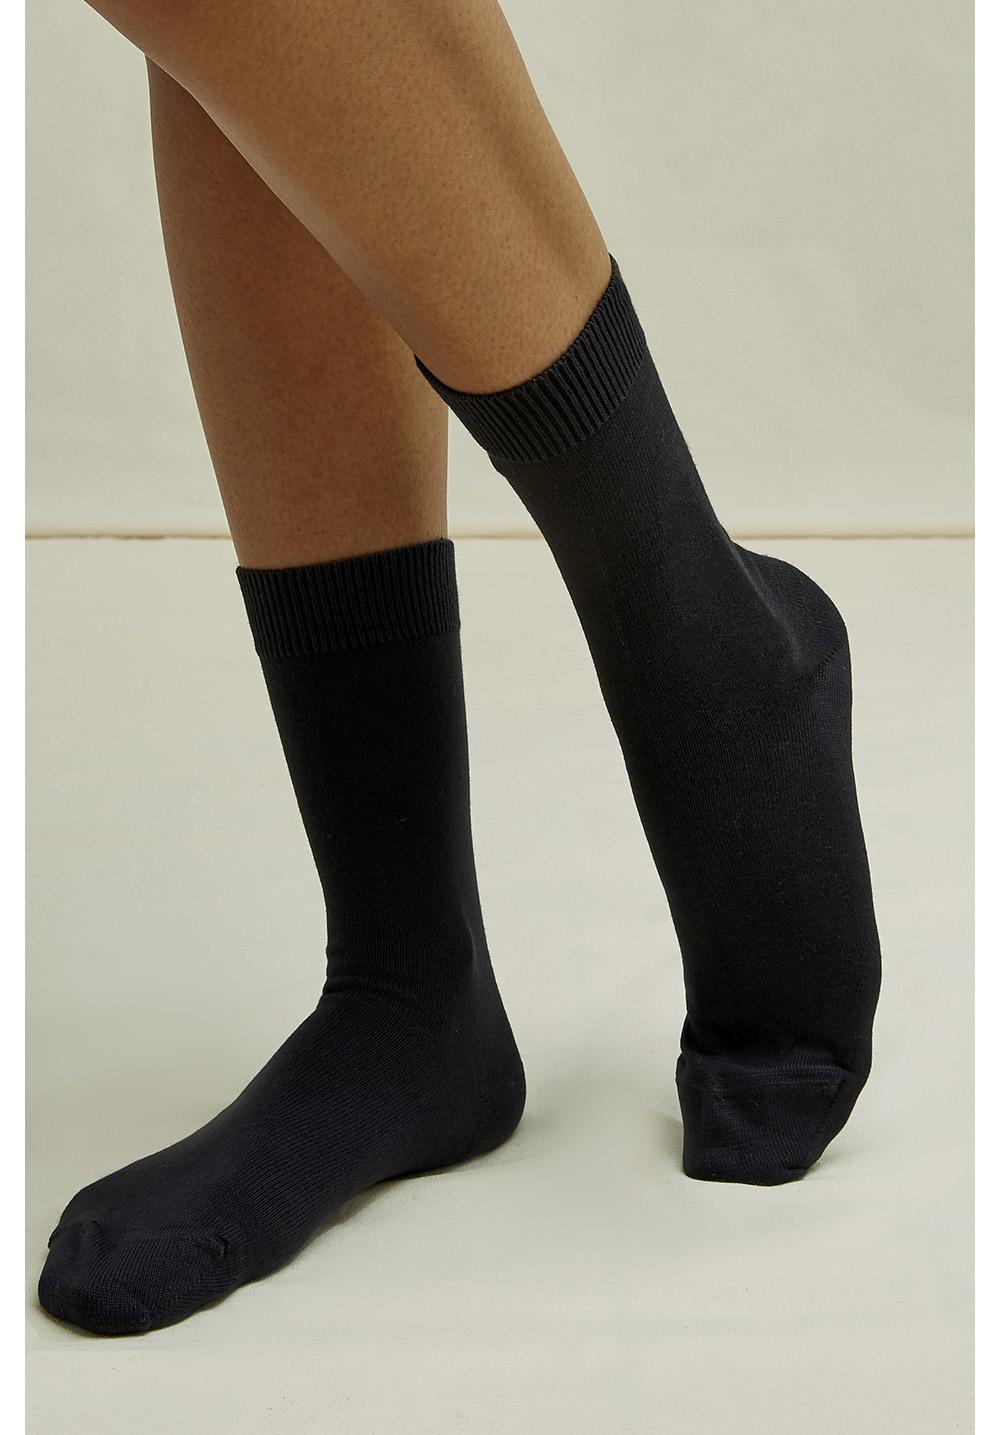 Organic Cotton Socks in Black